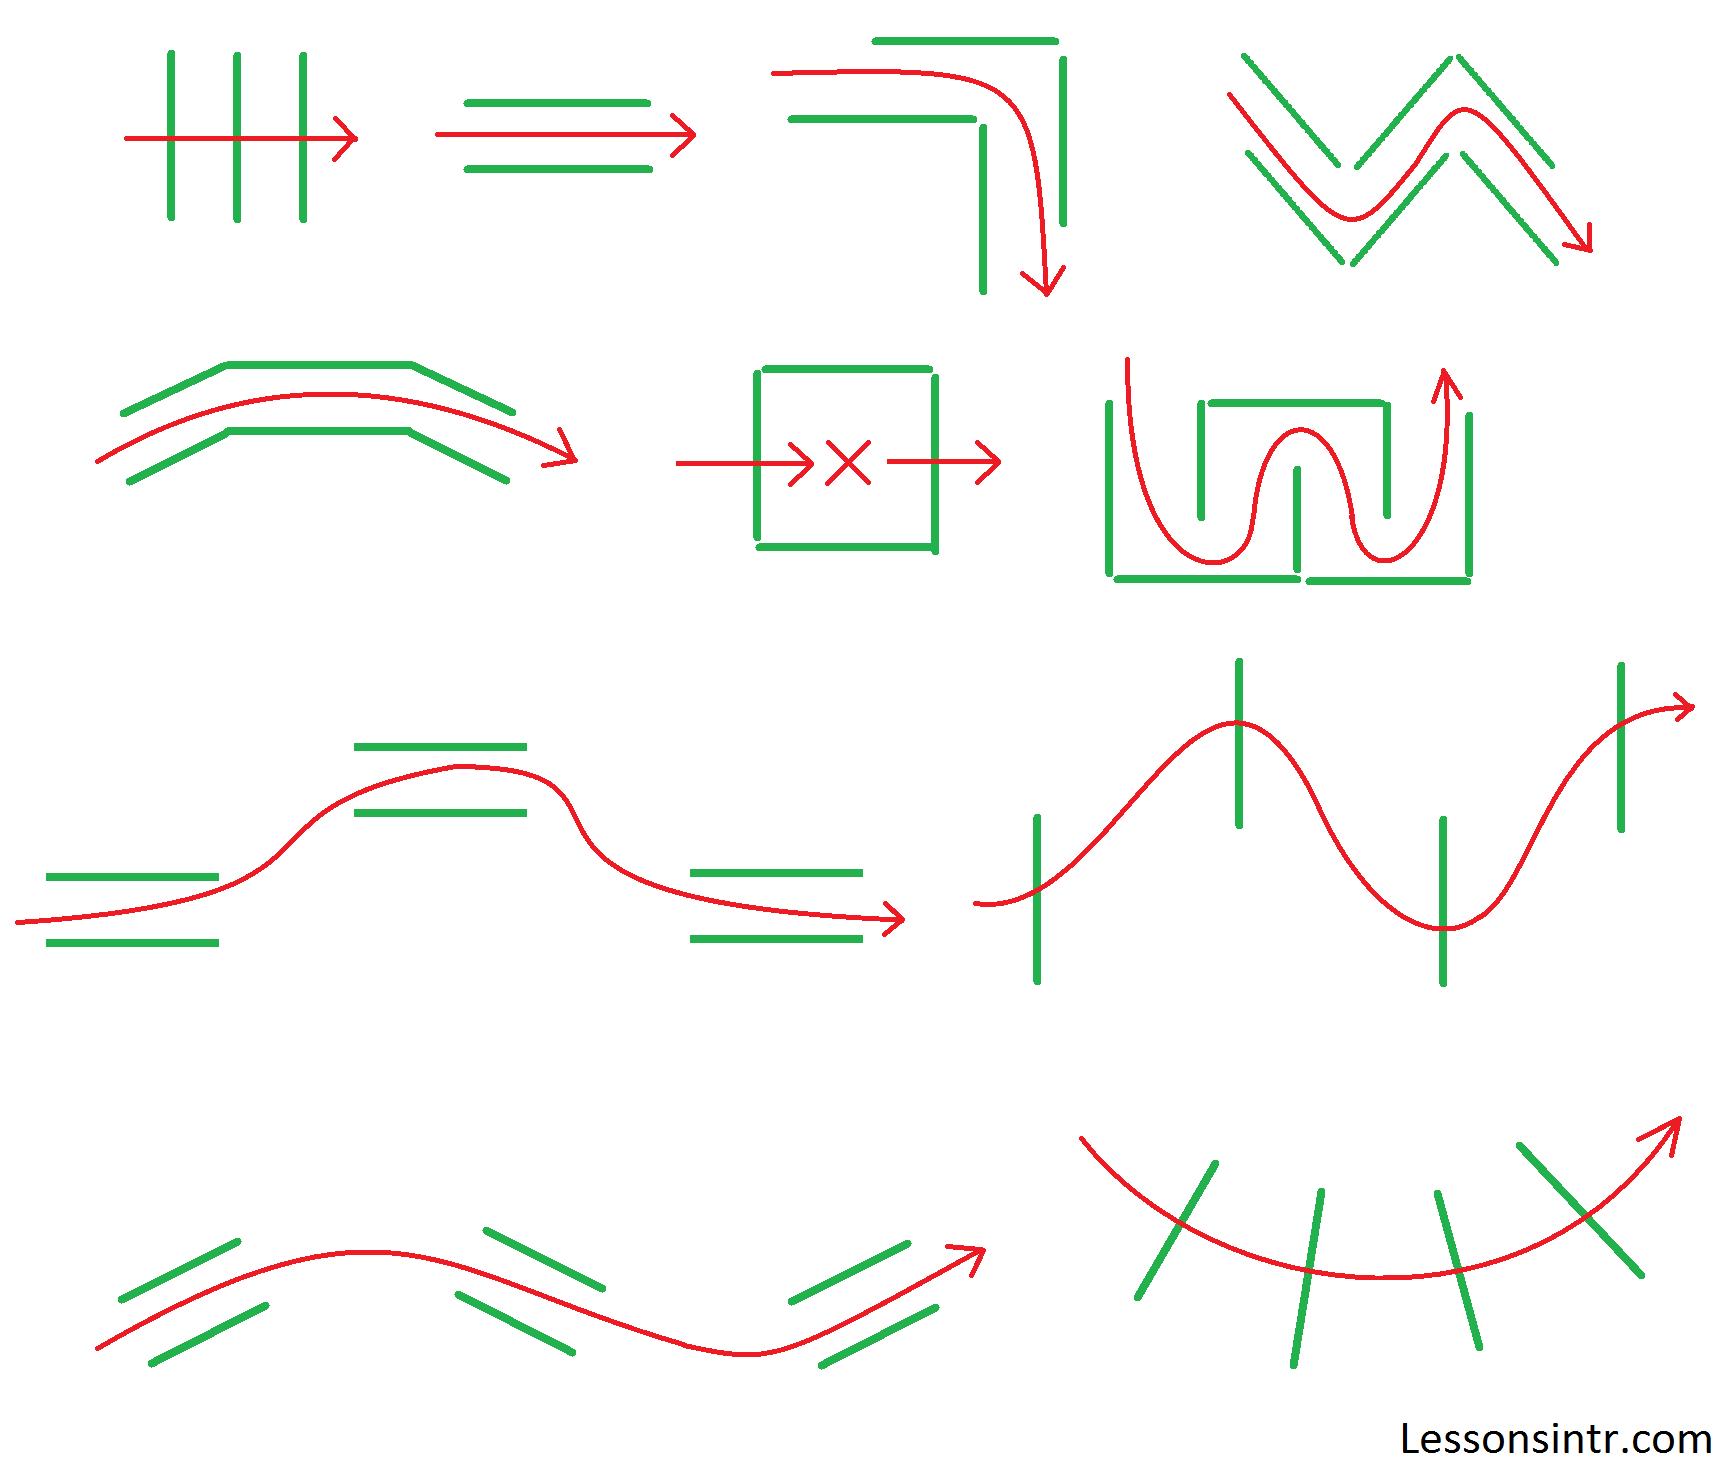 Trail Course Pattern Design